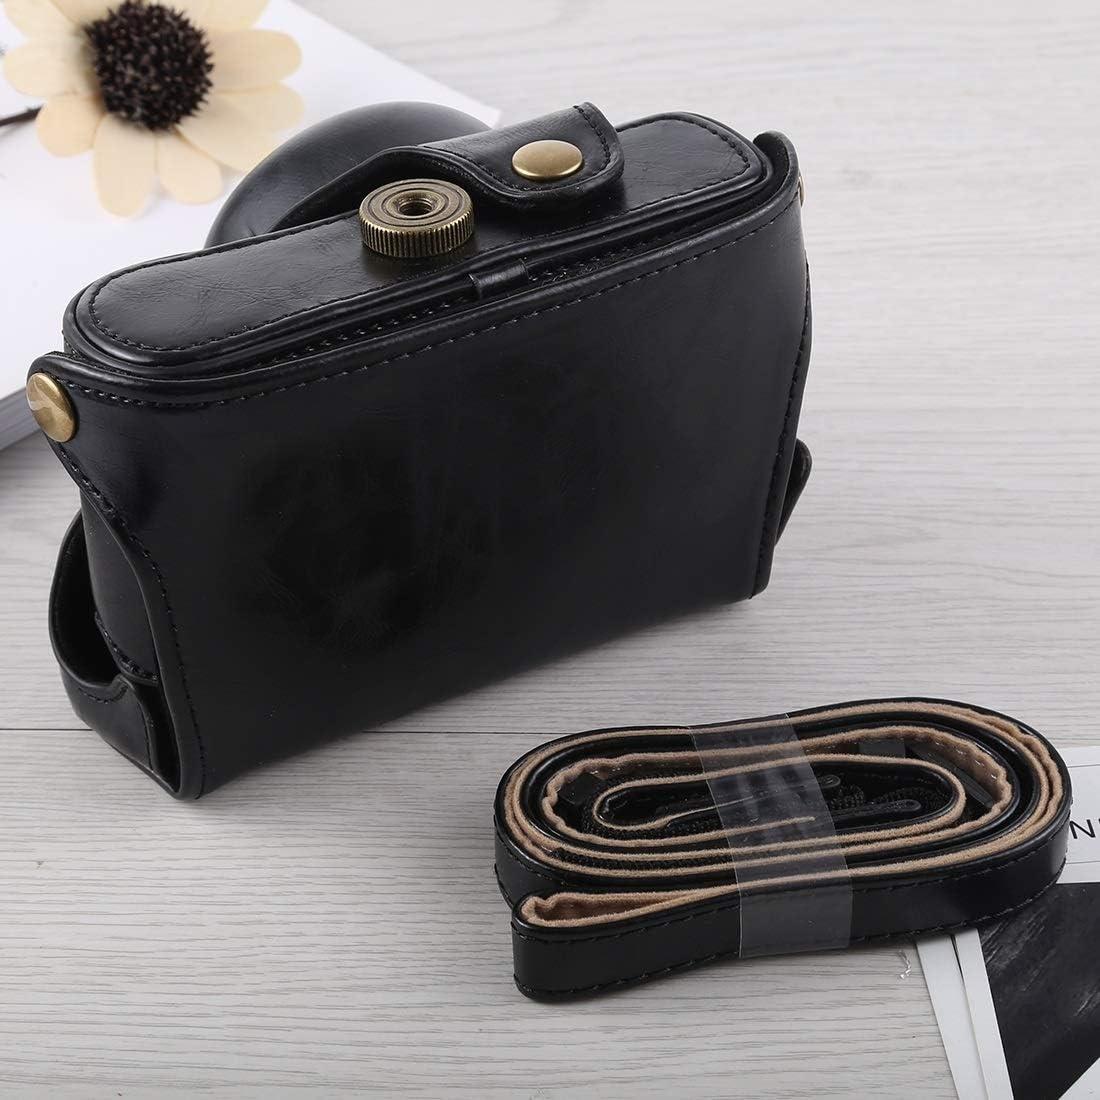 Ychaoya Camera Bag Wuzpx Entire Body Camera PU Leather Case Bag with Strap for Fujifilm X100F Color : Coffee Black